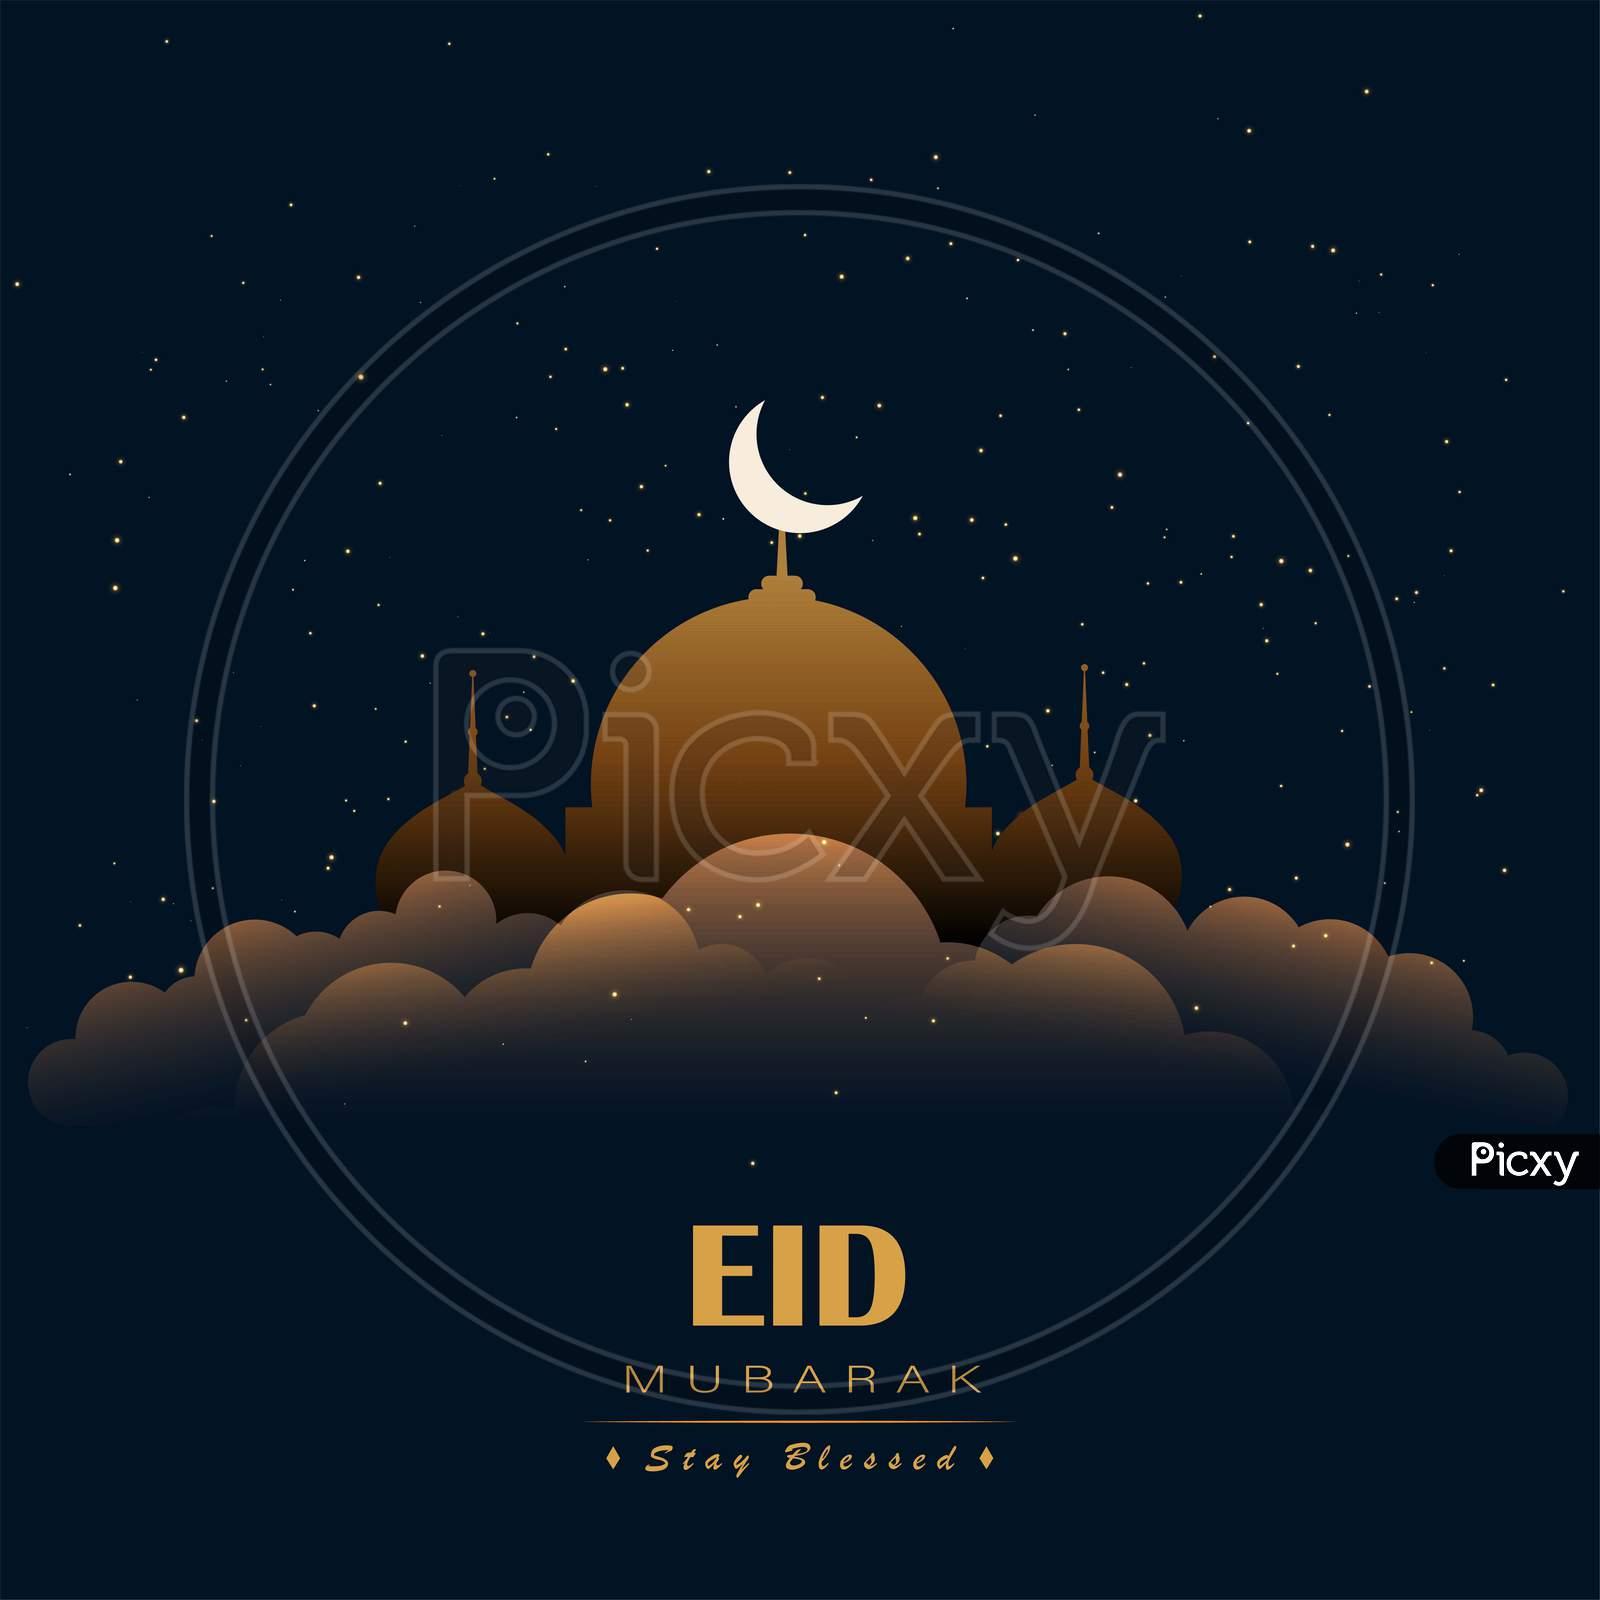 Eid Mubarak greeting poster, banner, card, illustration vector